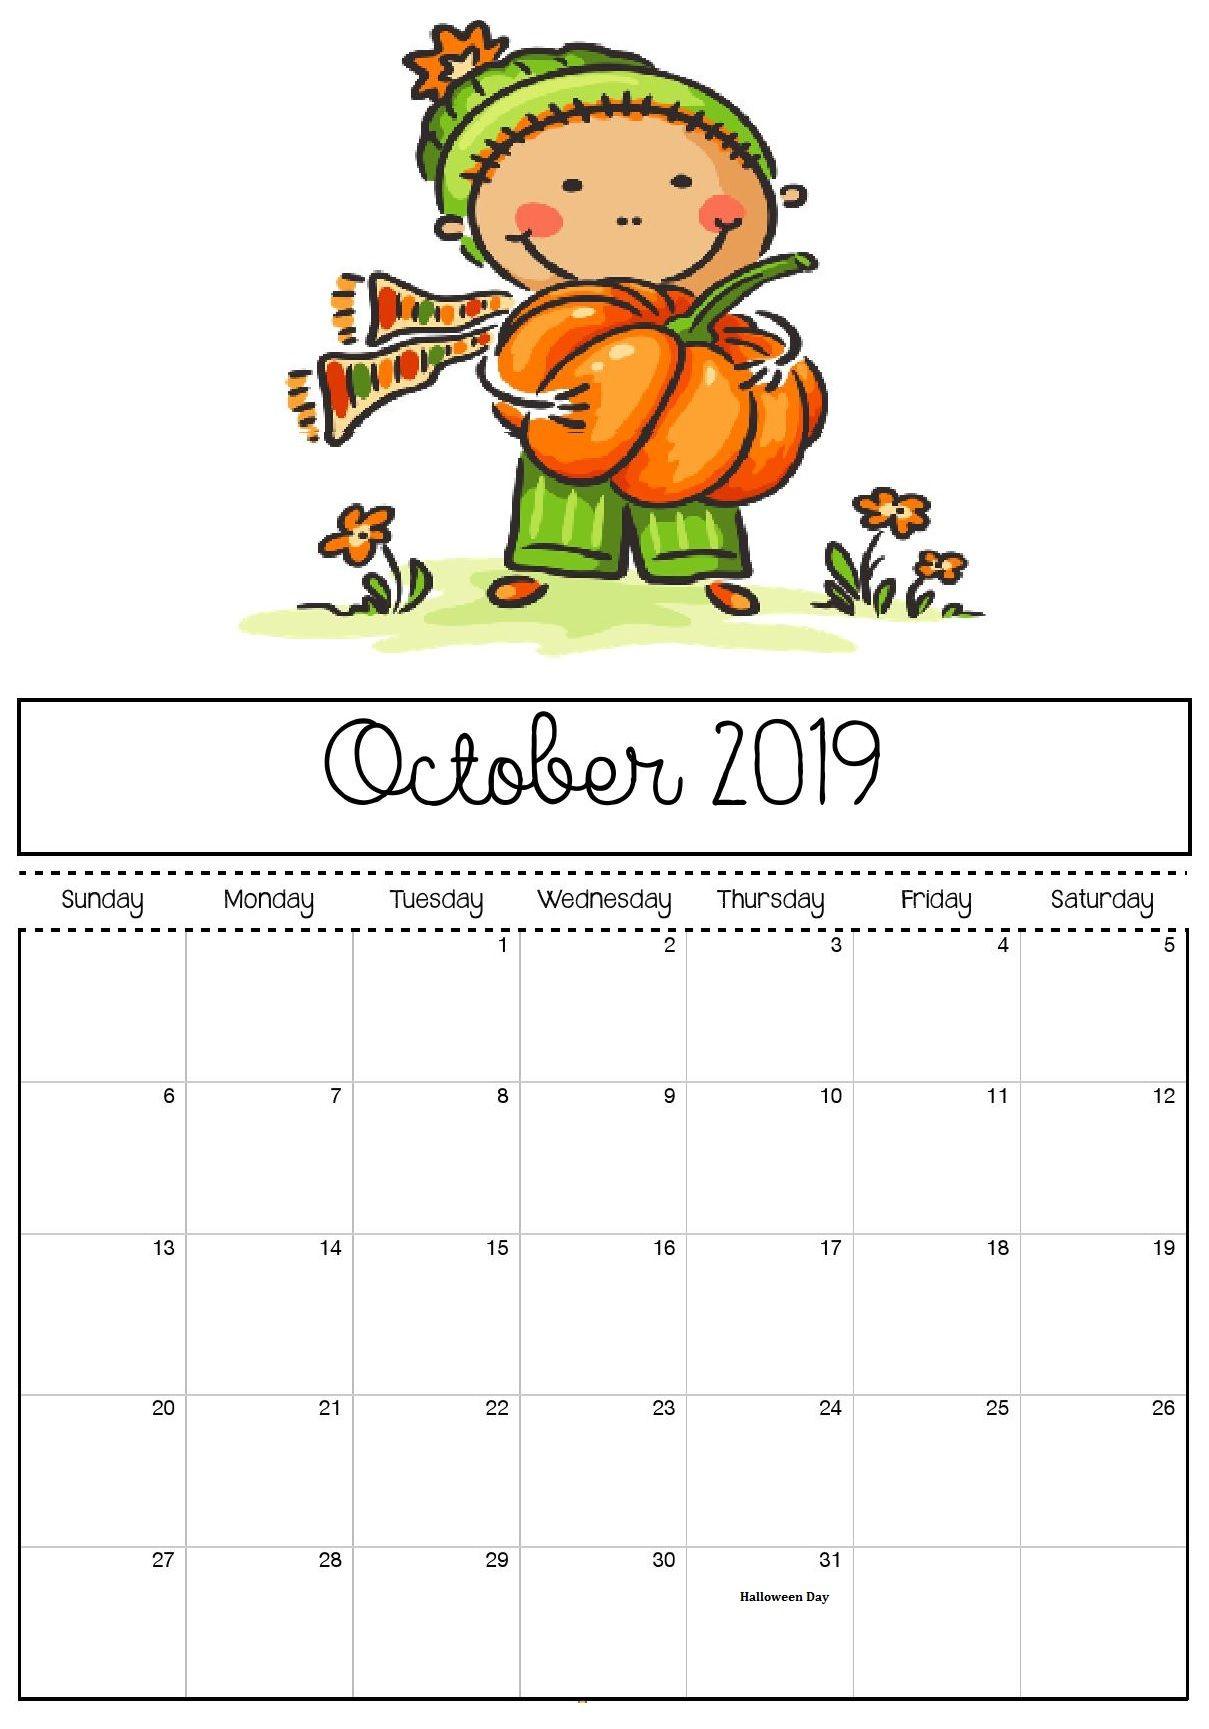 October 2019 Halloween Calendar Calendar 2018 2019 calendar 1209x1729